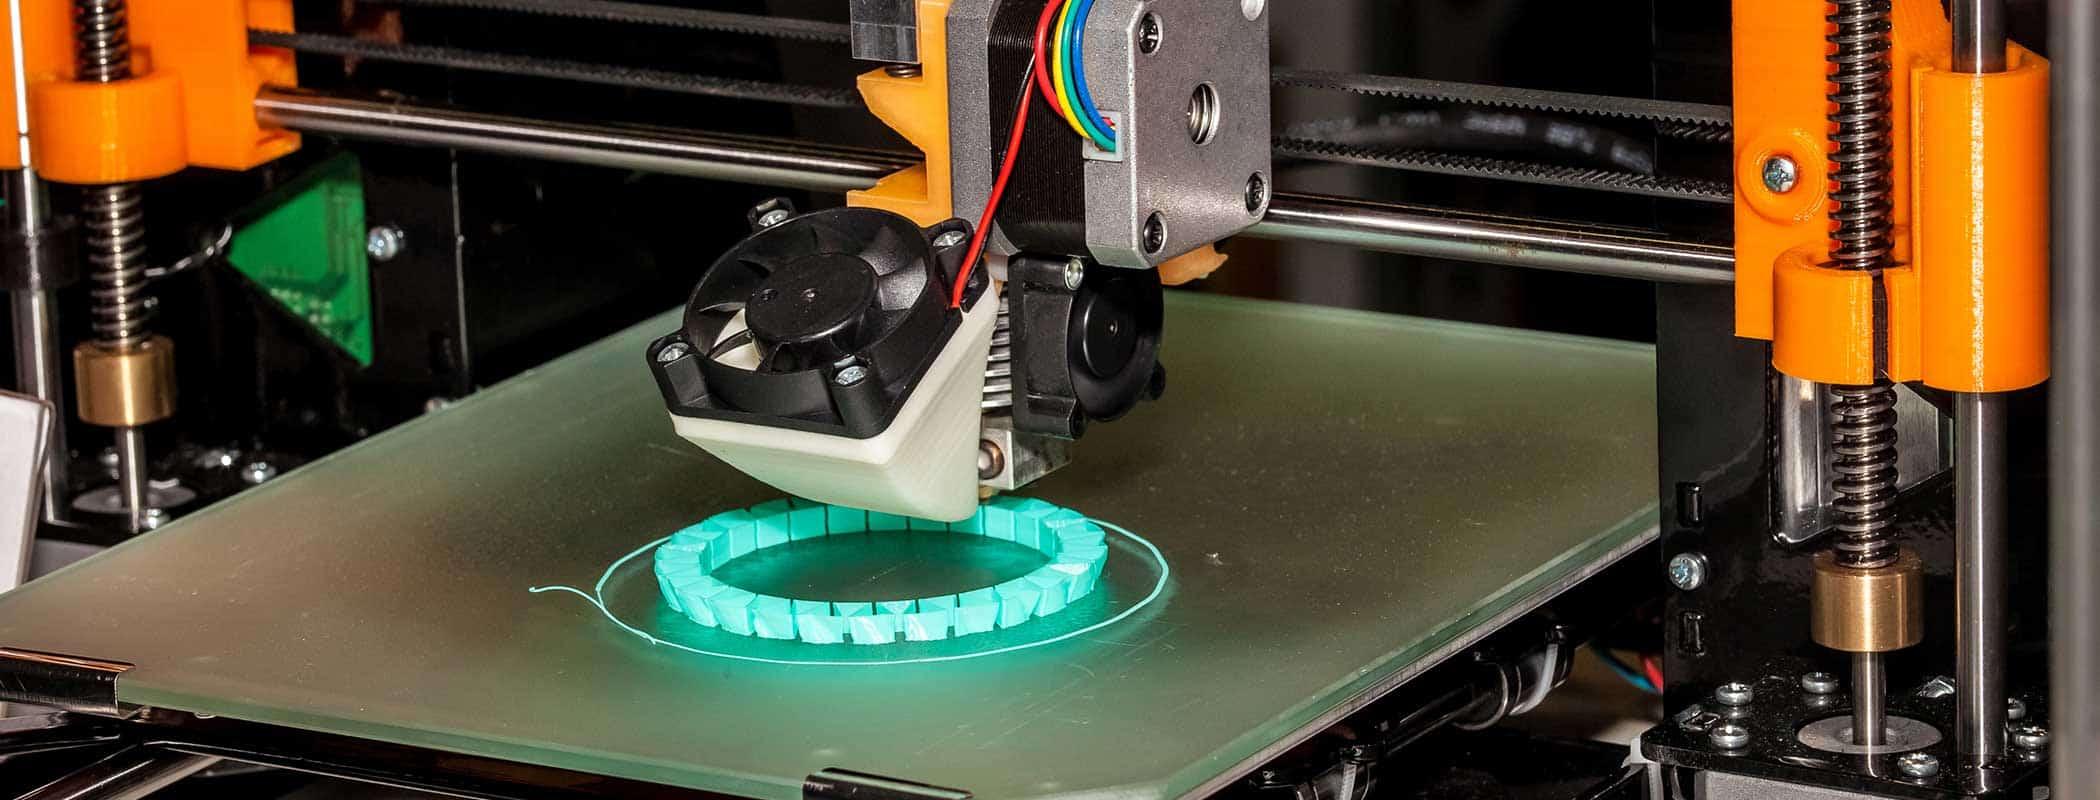 3D Printing: Create & Design